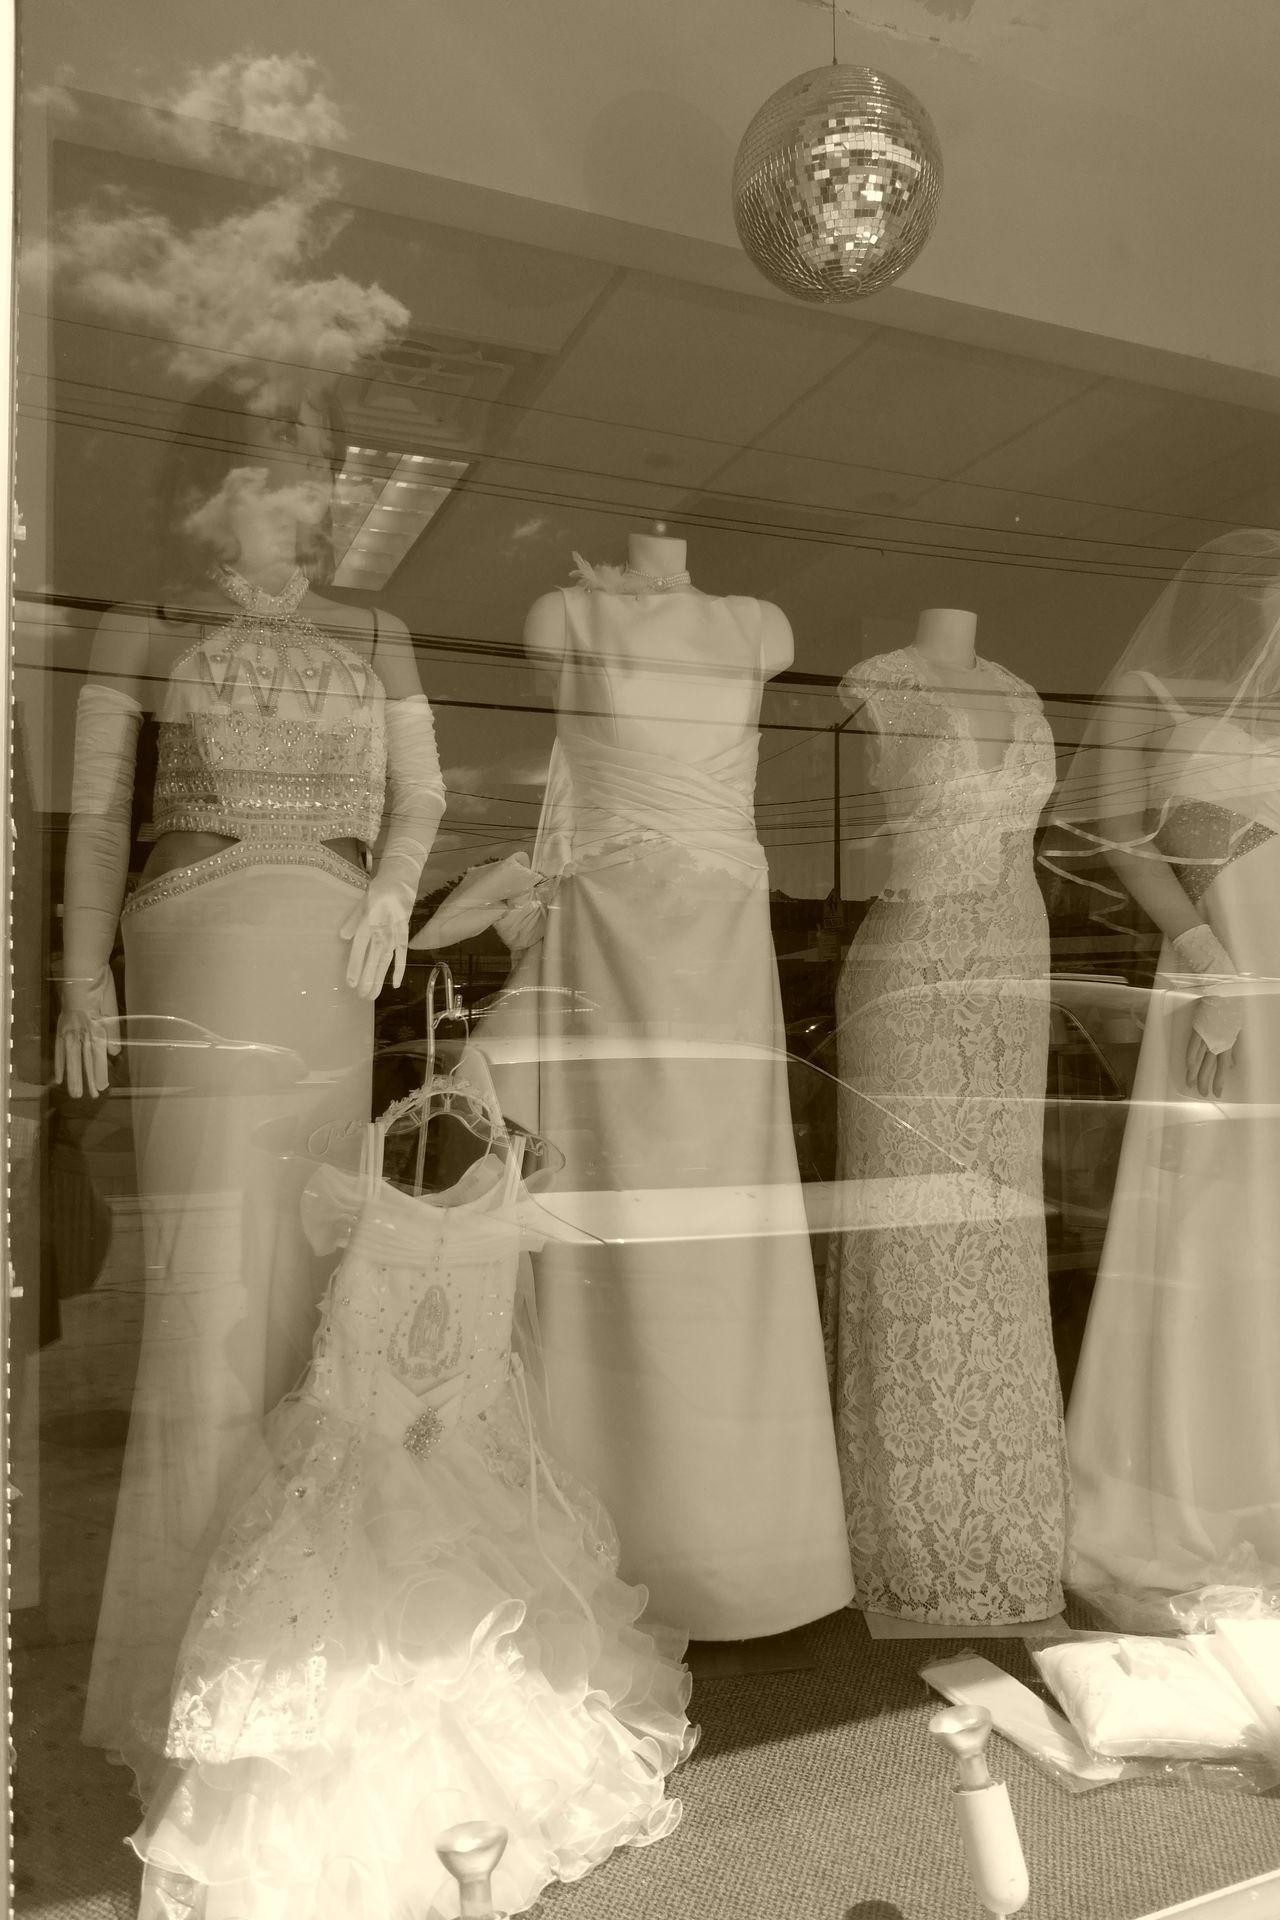 Window fashion show. Day Dress To Impress Dressing Up Fashion Fashion Photography Fashionista Manequin Manequins Window Reflections Window Shopping Windowreflection Windowreflections Discoball